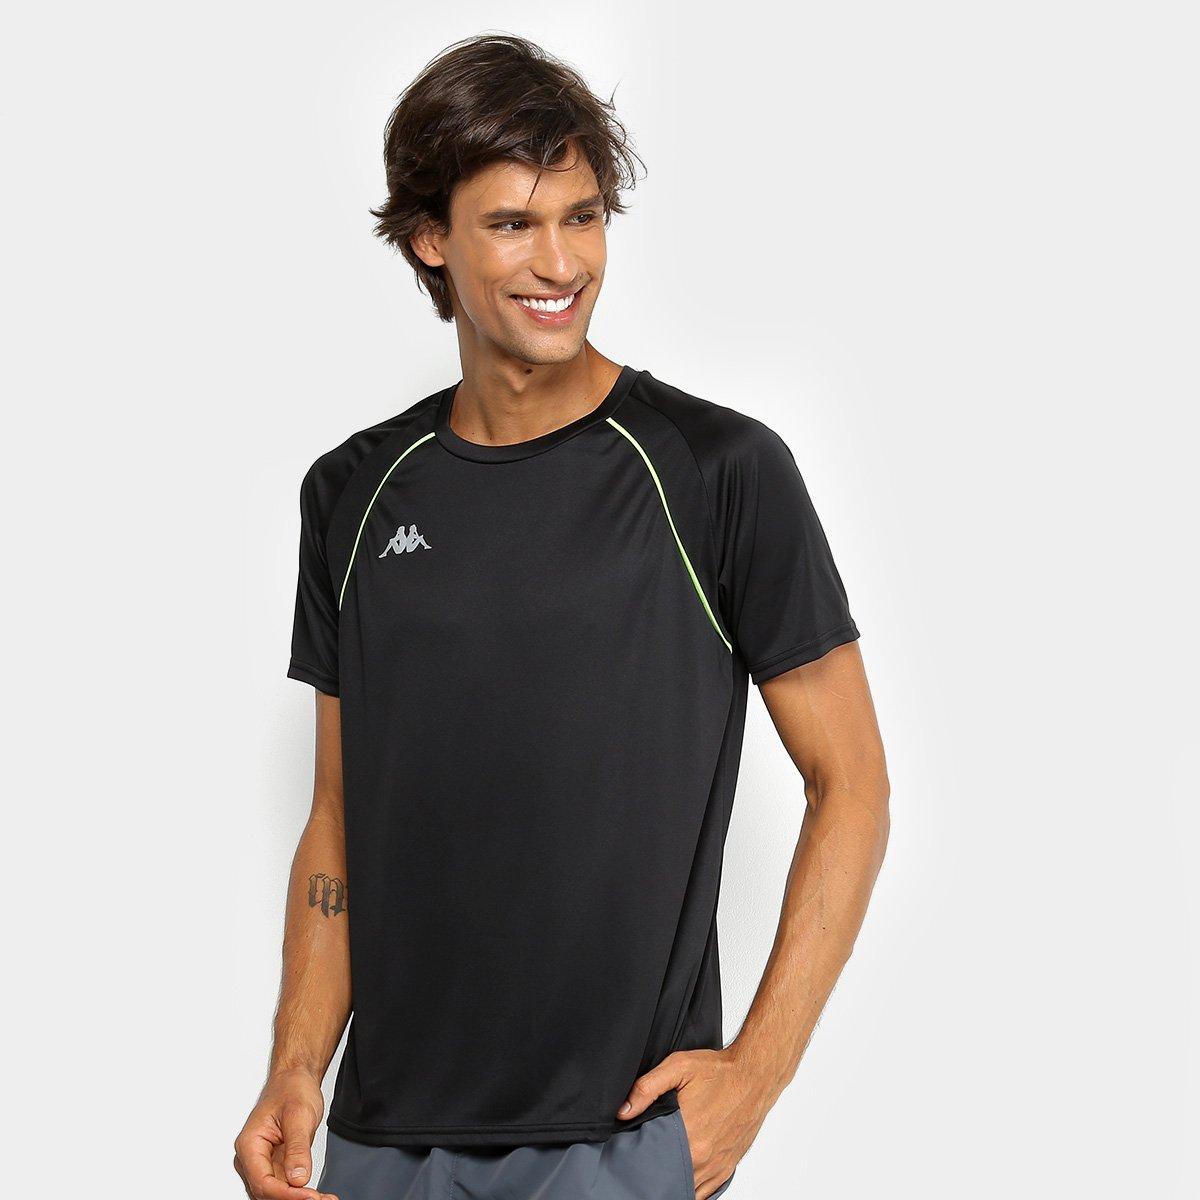 e83016e4e Camiseta Kappa Runner Masculina